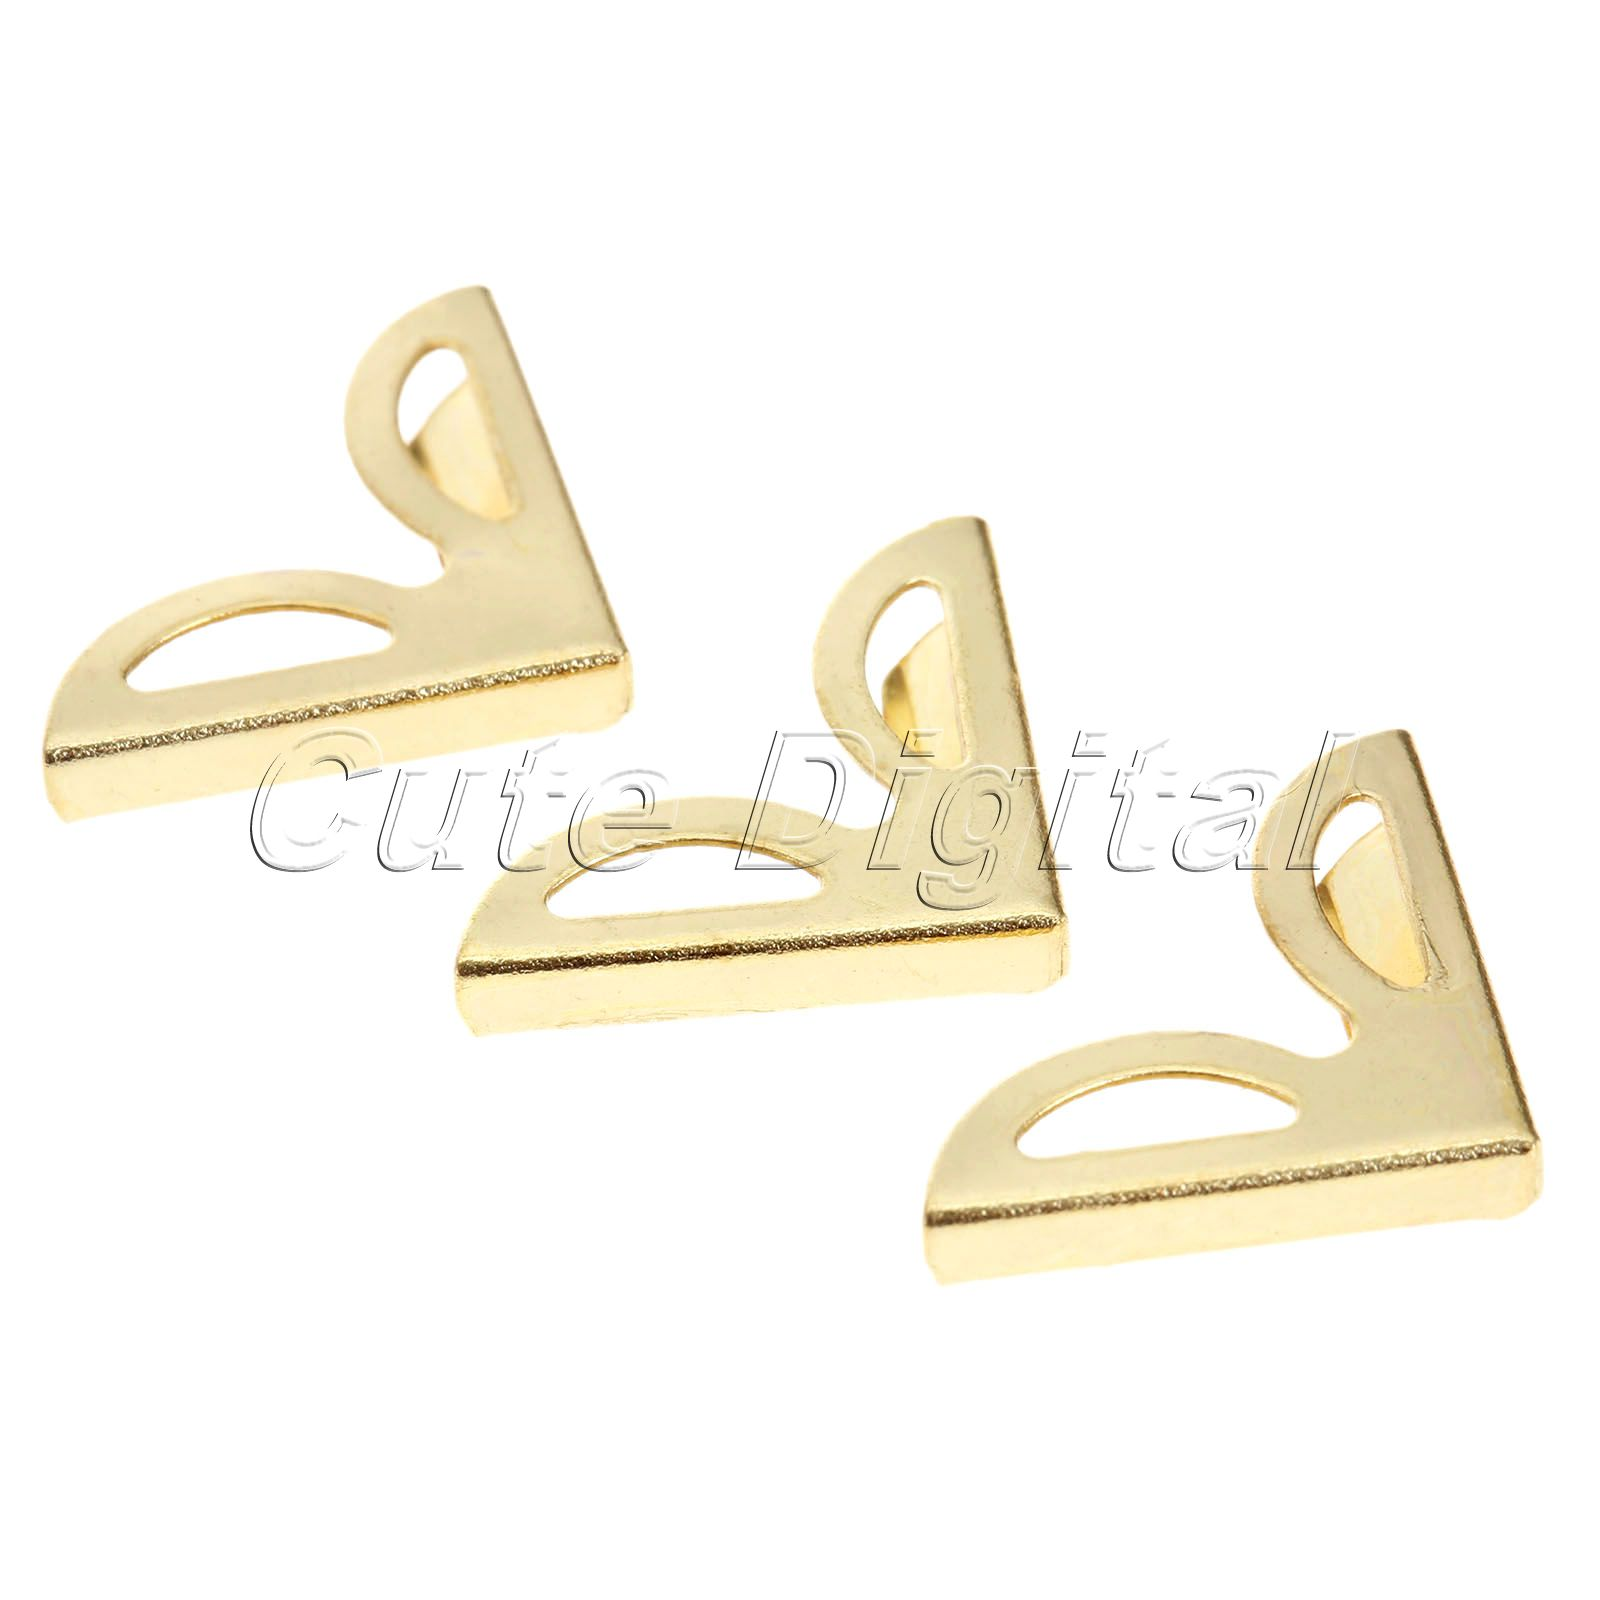 100pcs 16x16mm Golden Decorative Metal Corner Brackets For Books ...